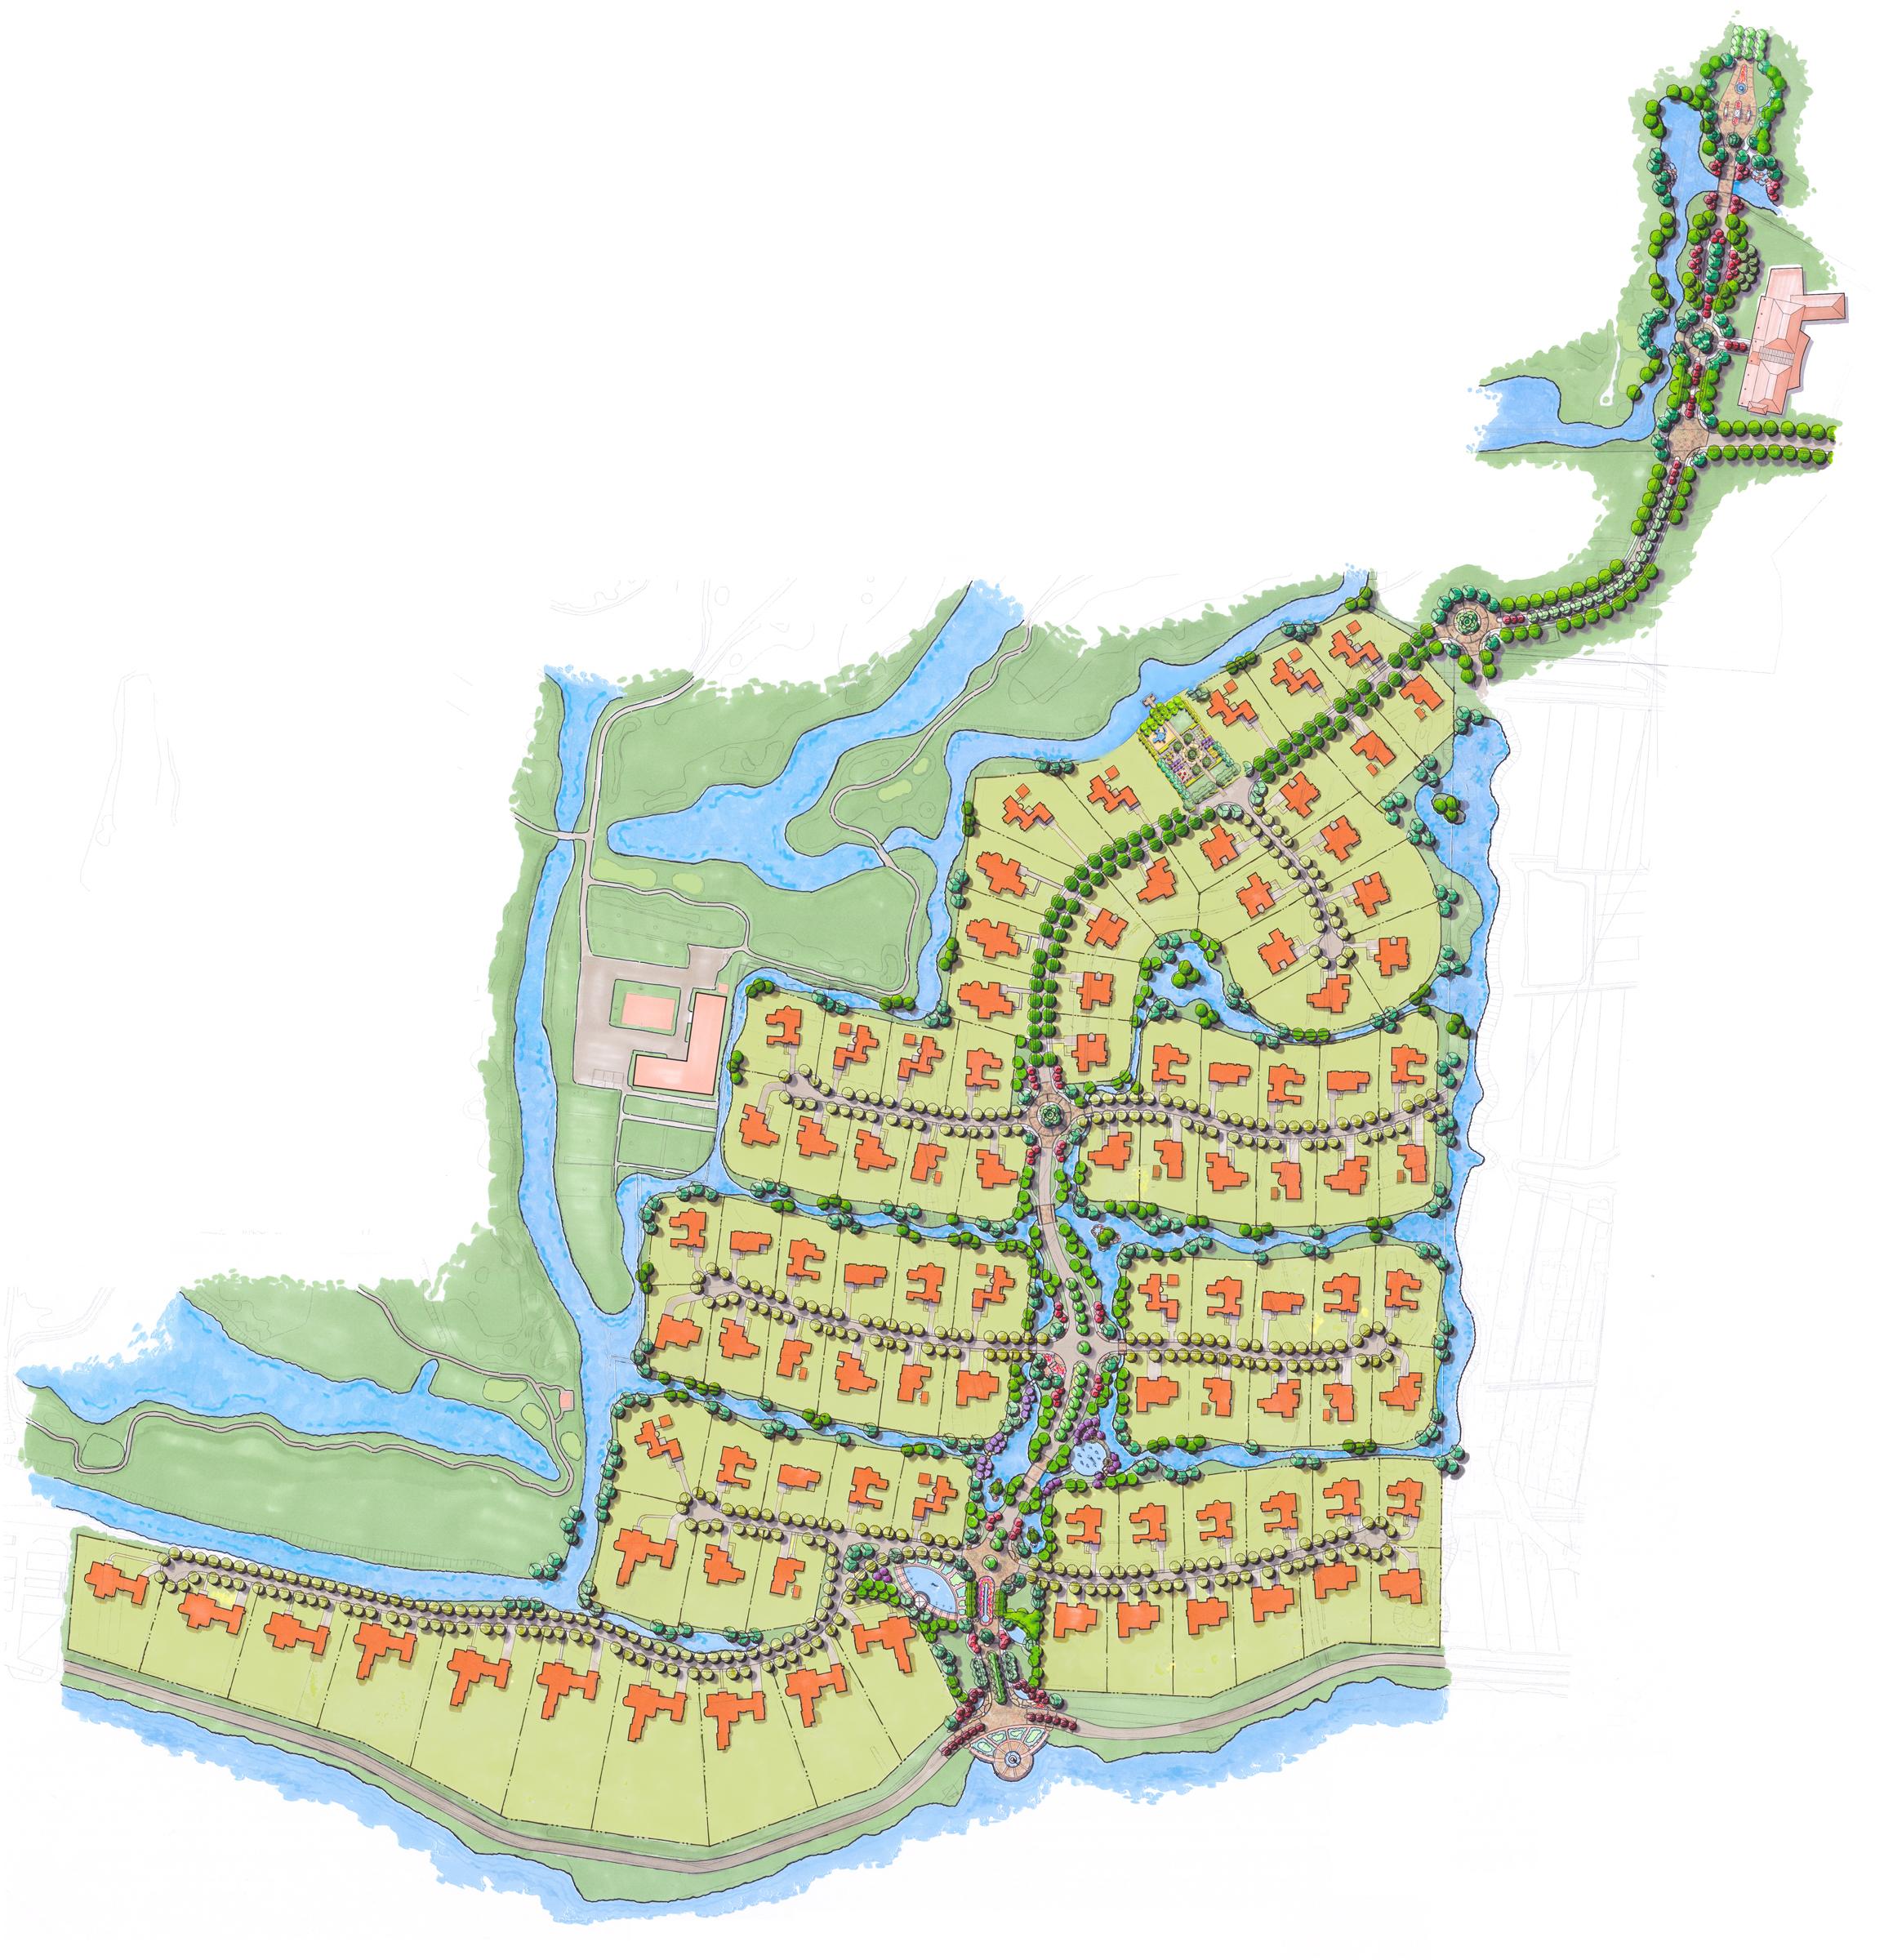 Zijing-OVERALL SITE PLAN-FORM-full.jpg